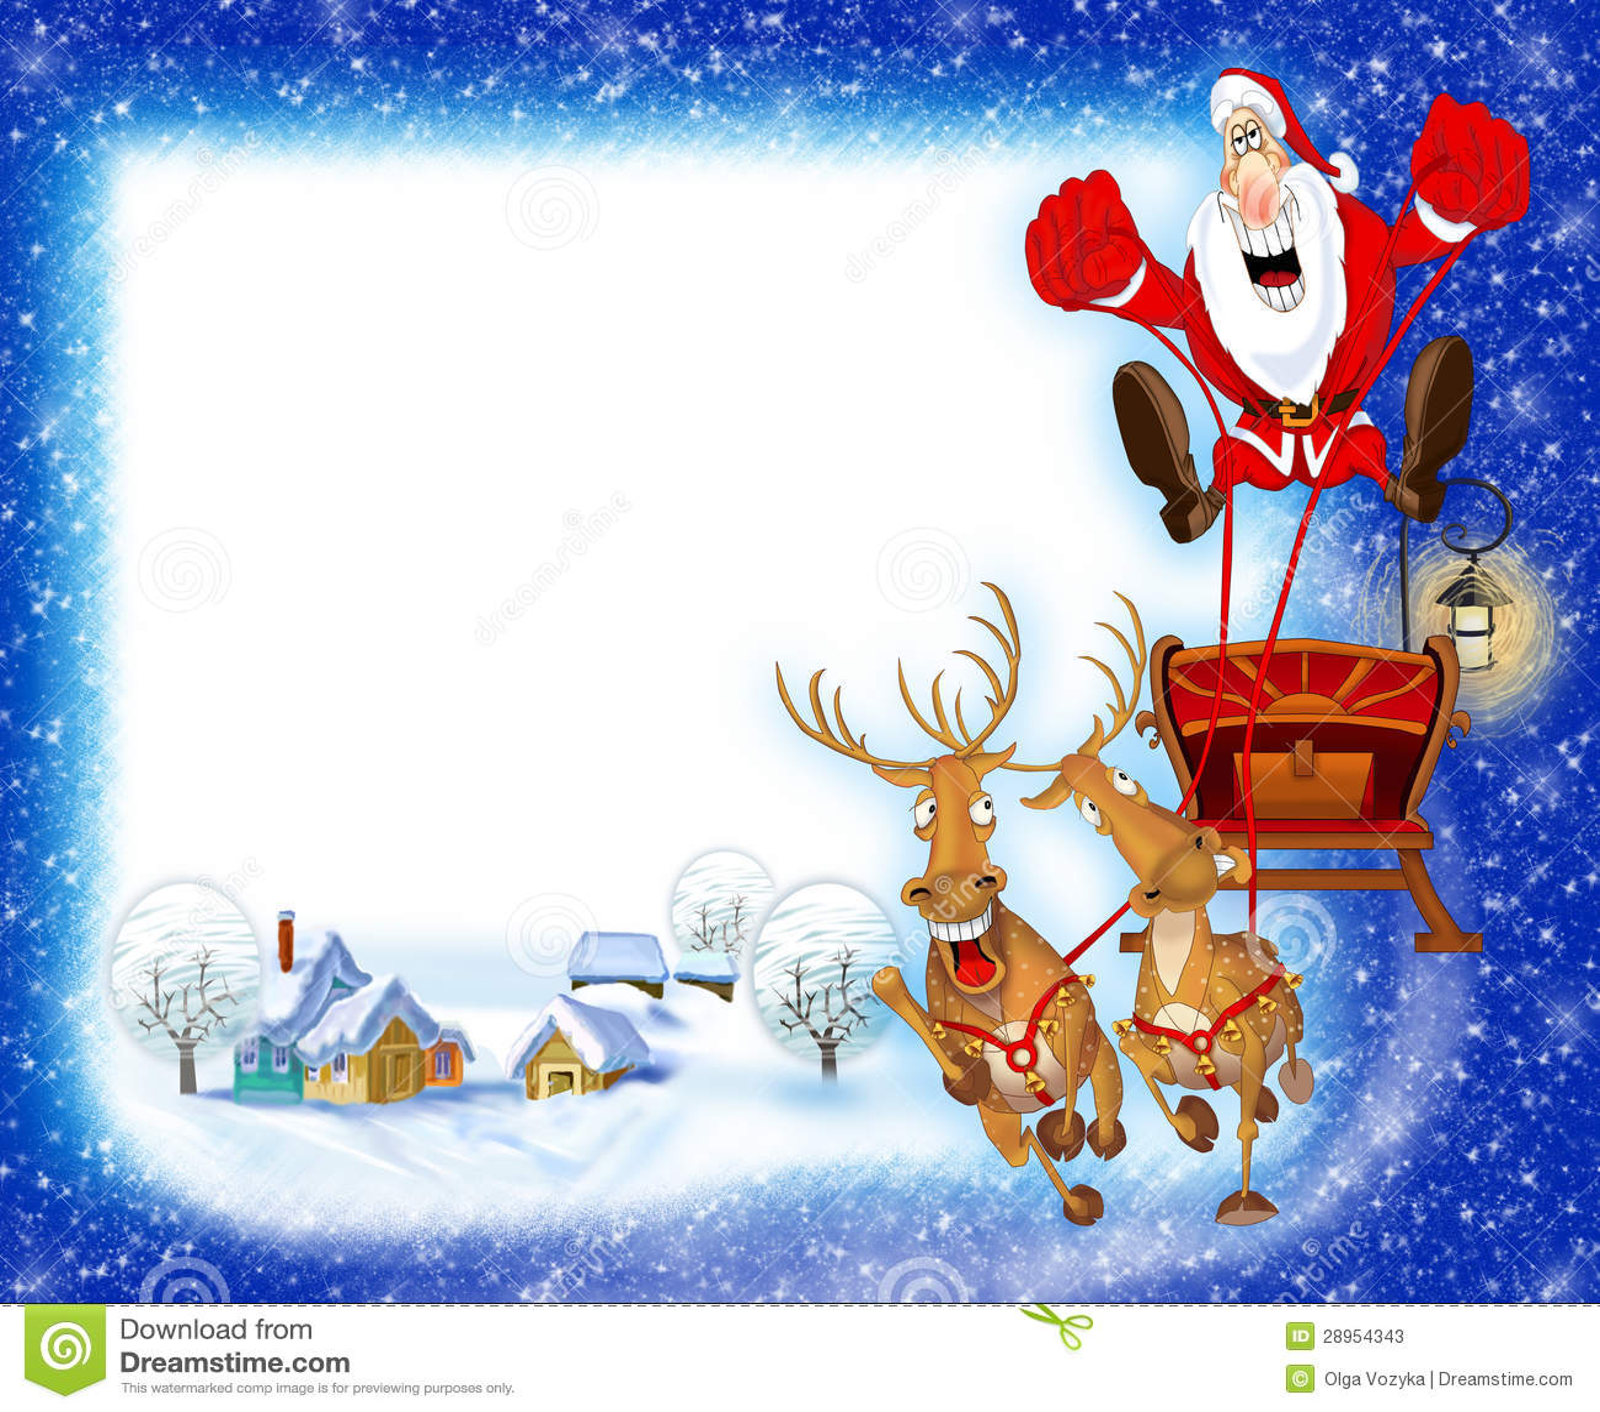 Предпосылка Кристмас с Дед Мороз